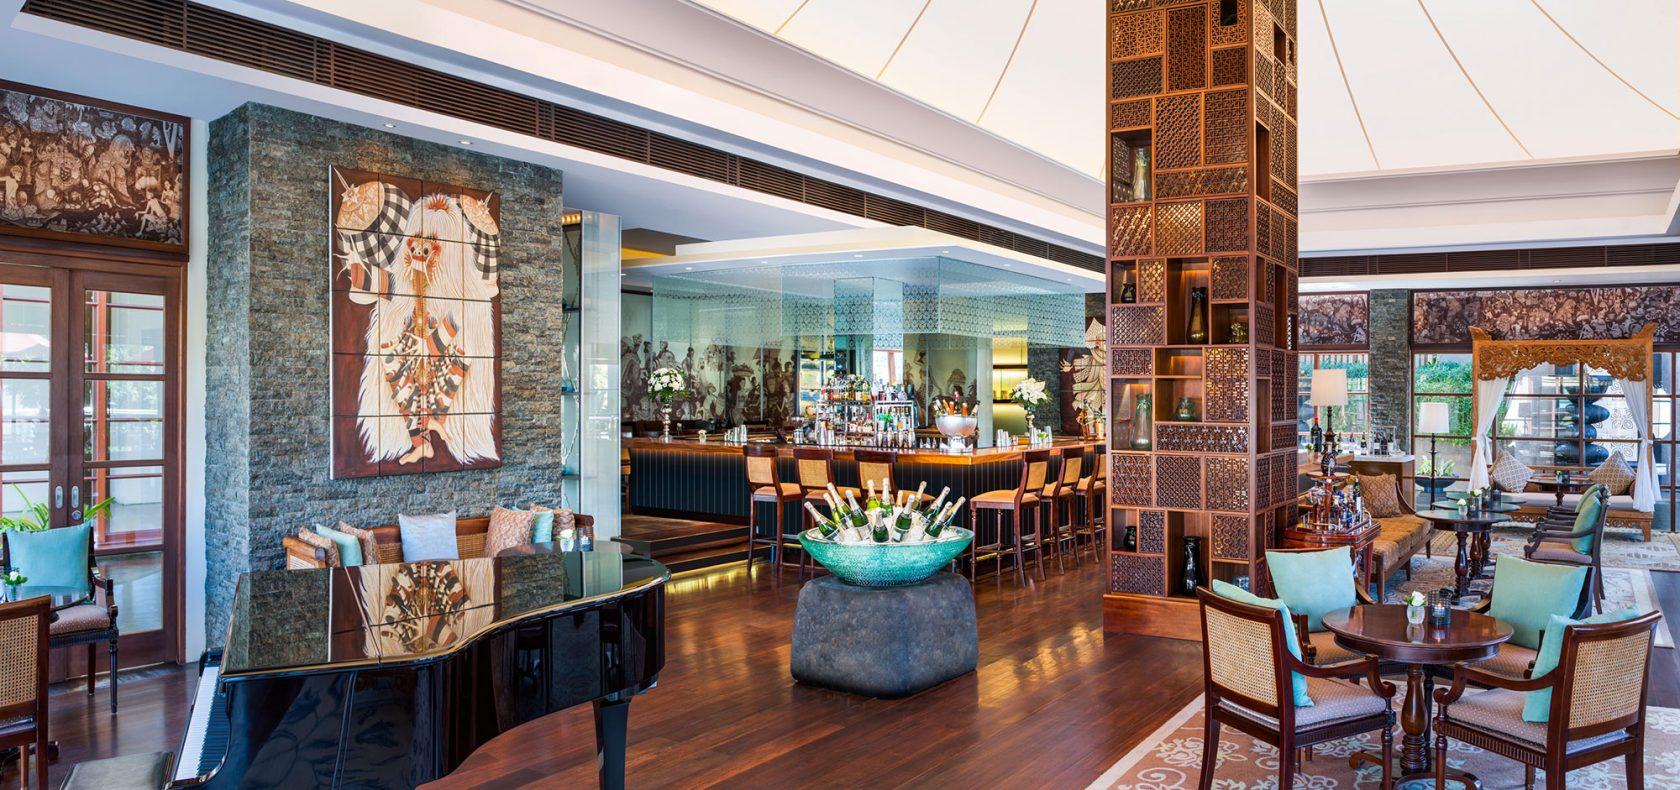 The St. Regis Bali King Cole Bar